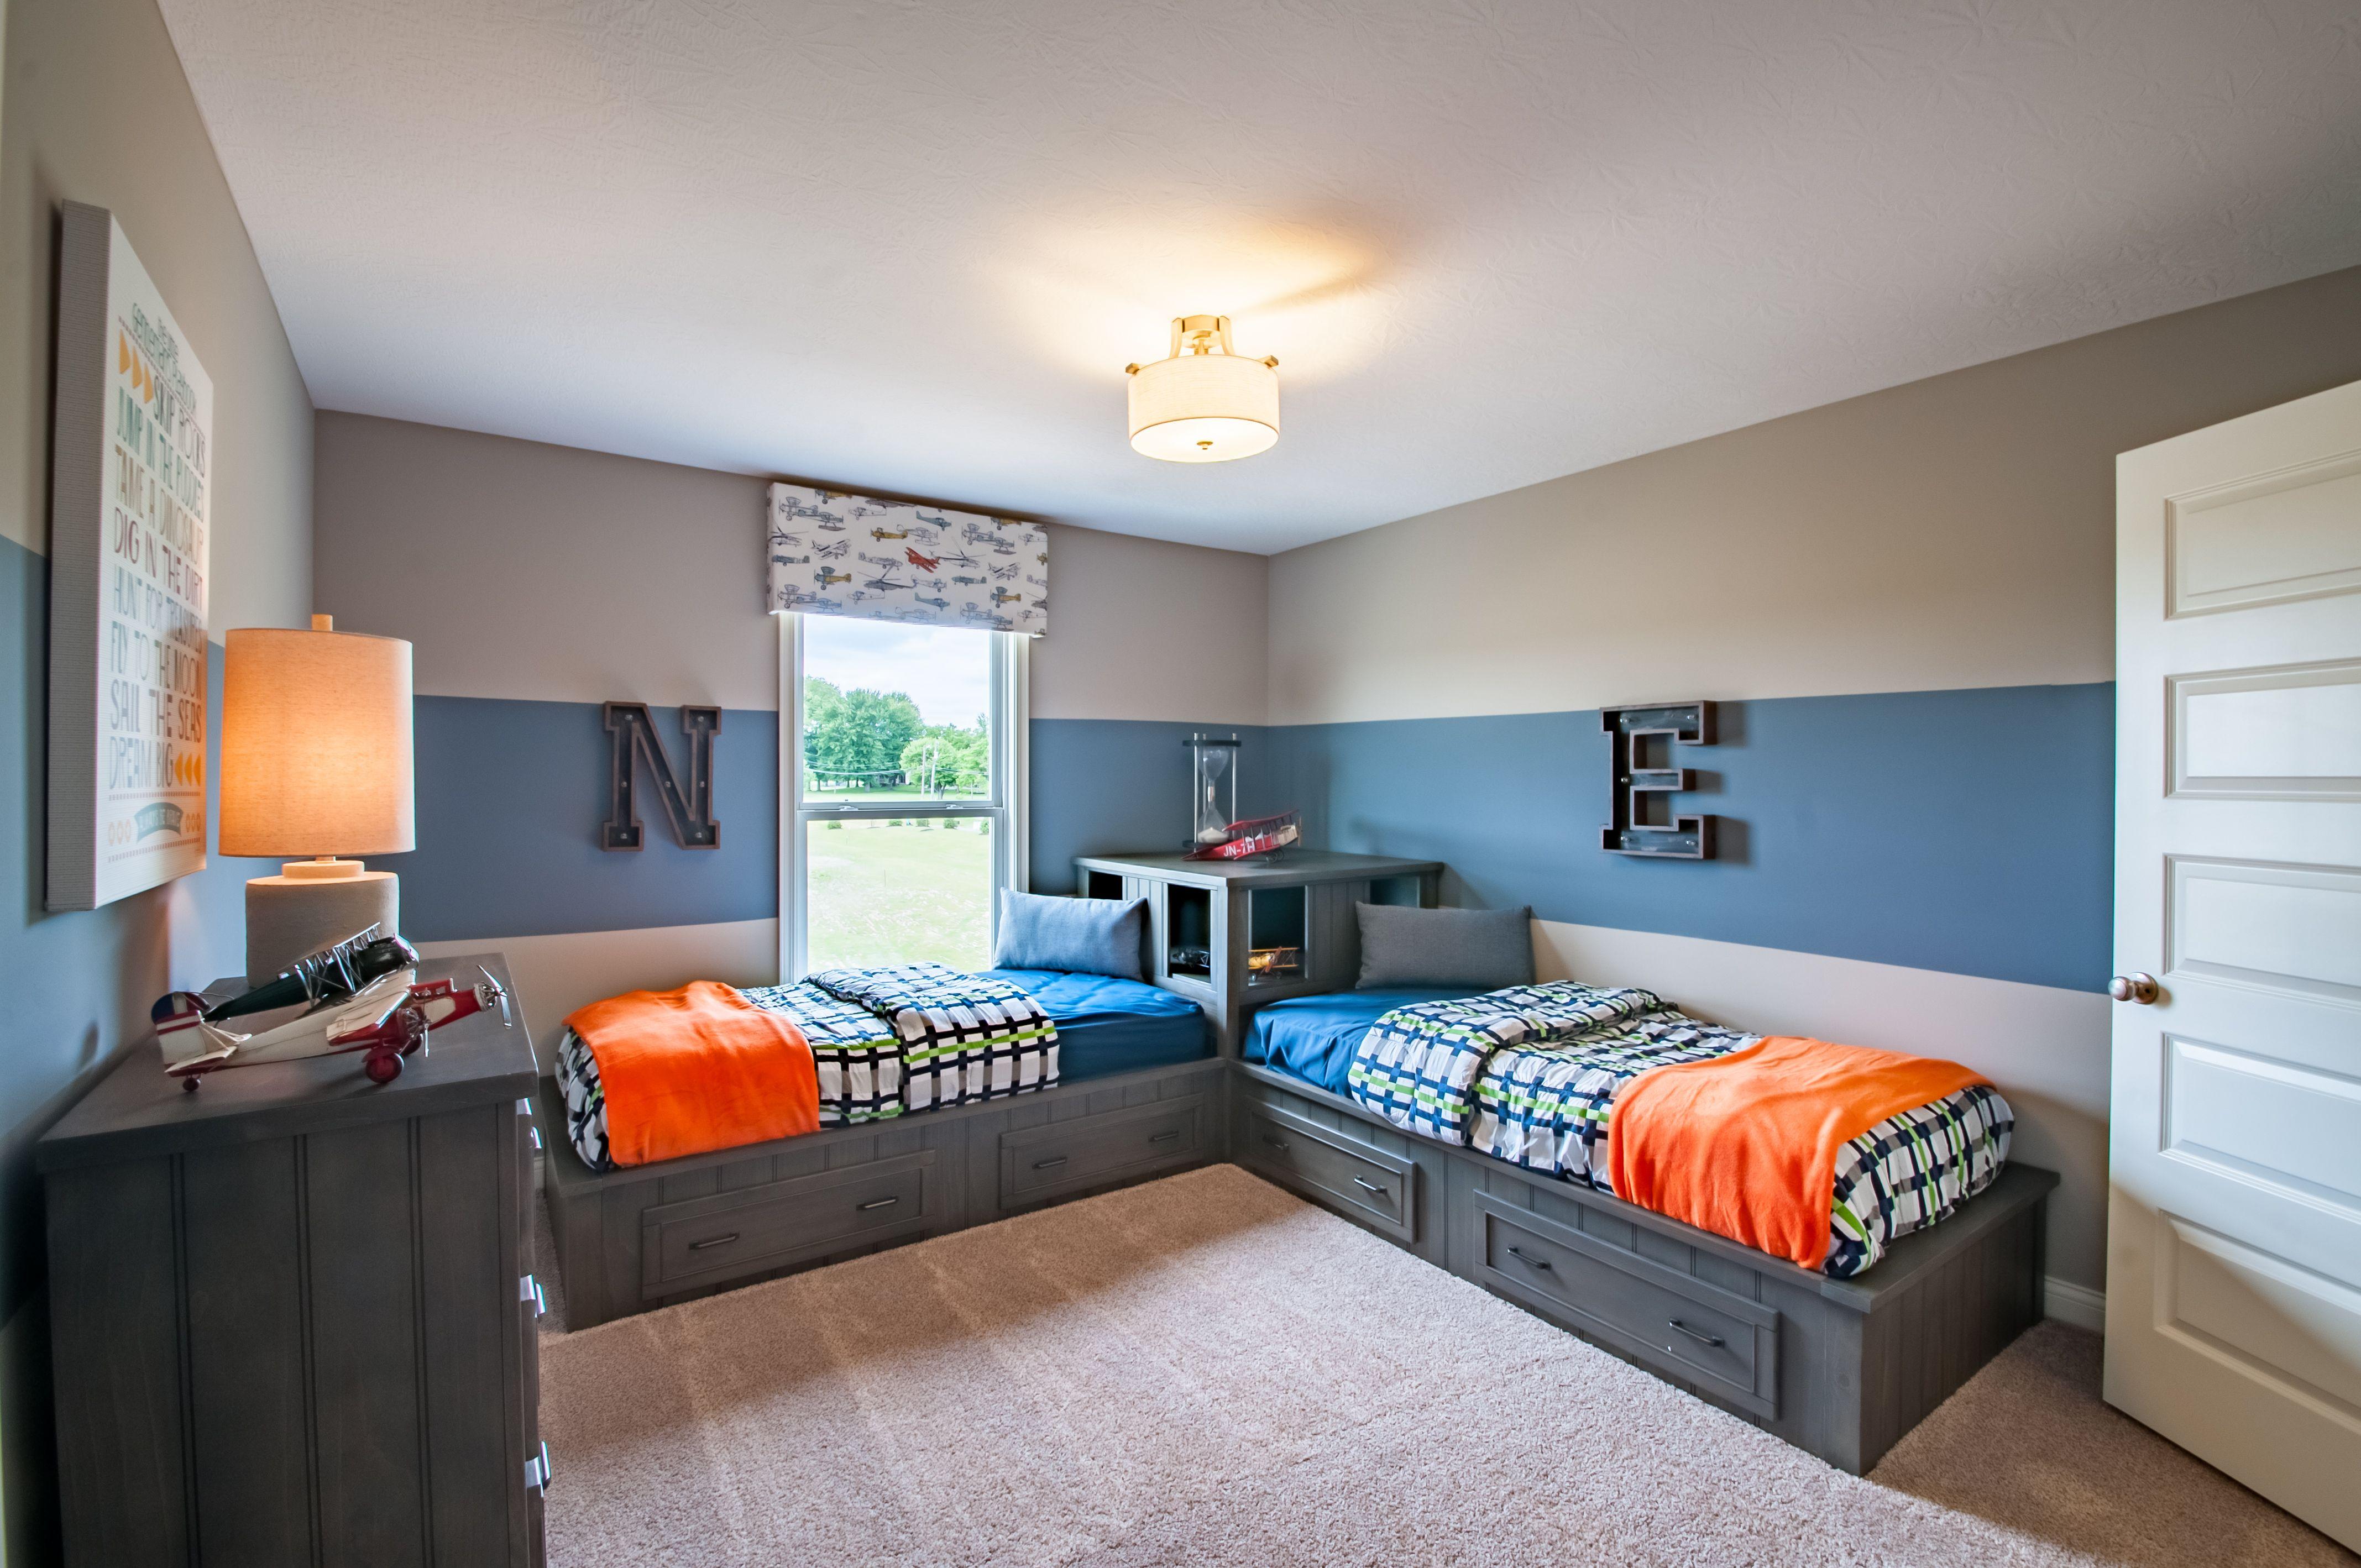 Bedroom featured in the Foster By Fischer Homes  in Atlanta, GA